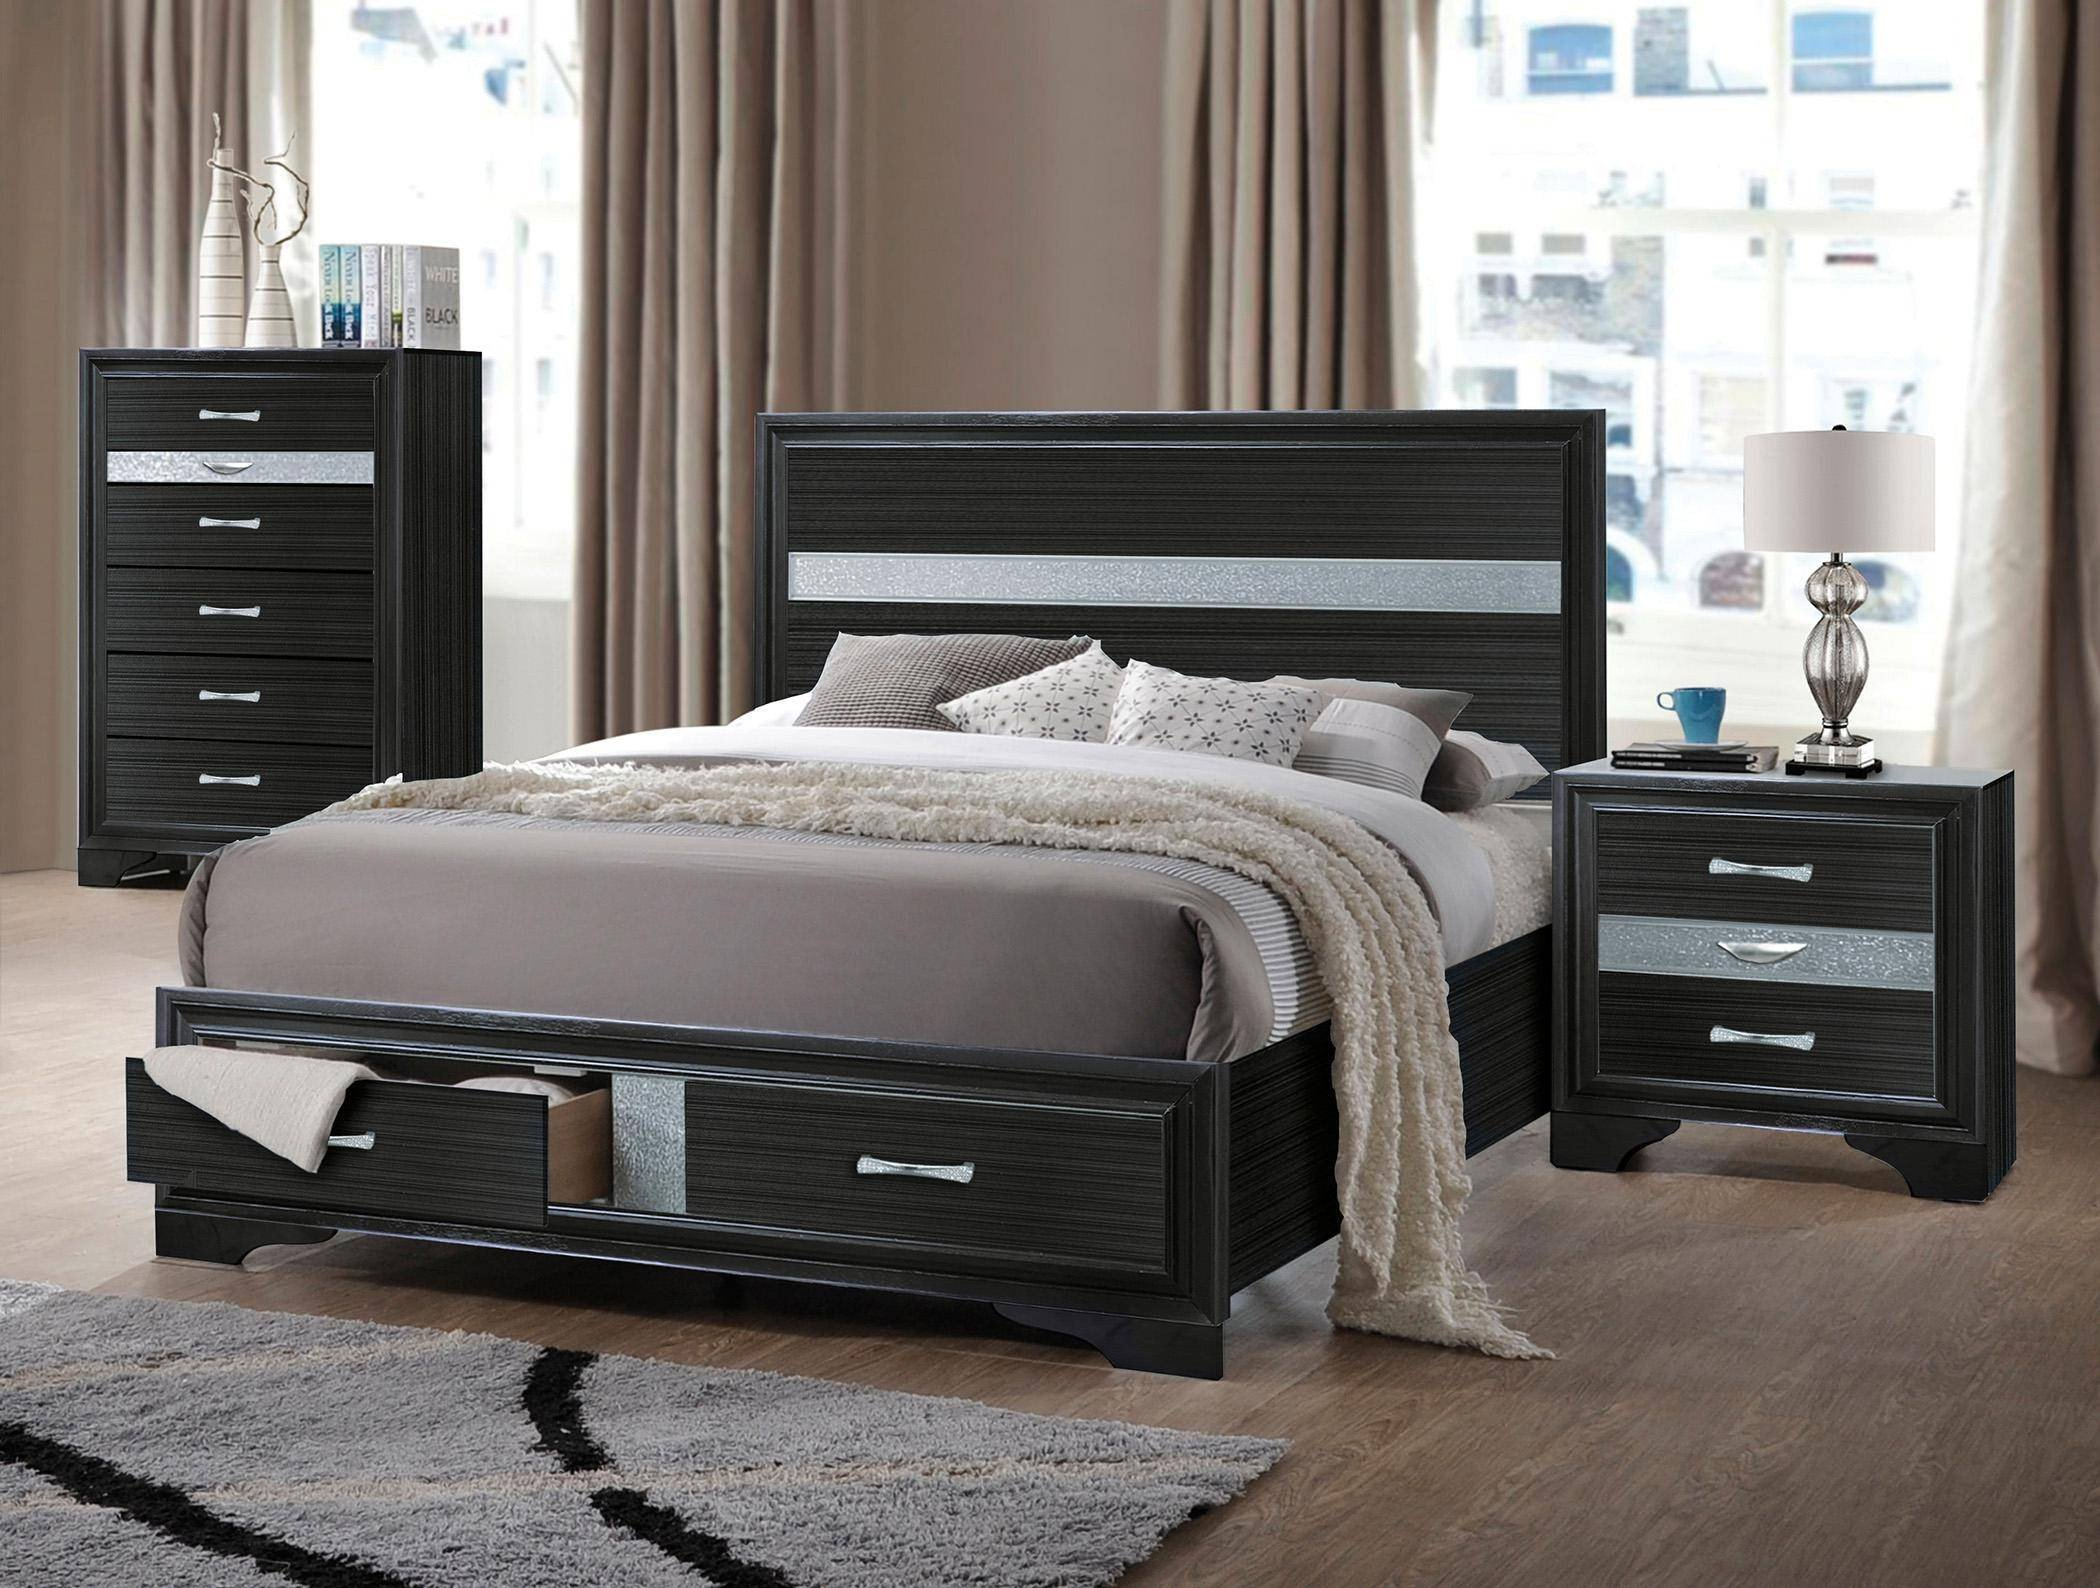 Mission Style Bedroom Furniture Inspirational Black Wood Queen Storage Bedroom Set 4pcs Naima Q Acme